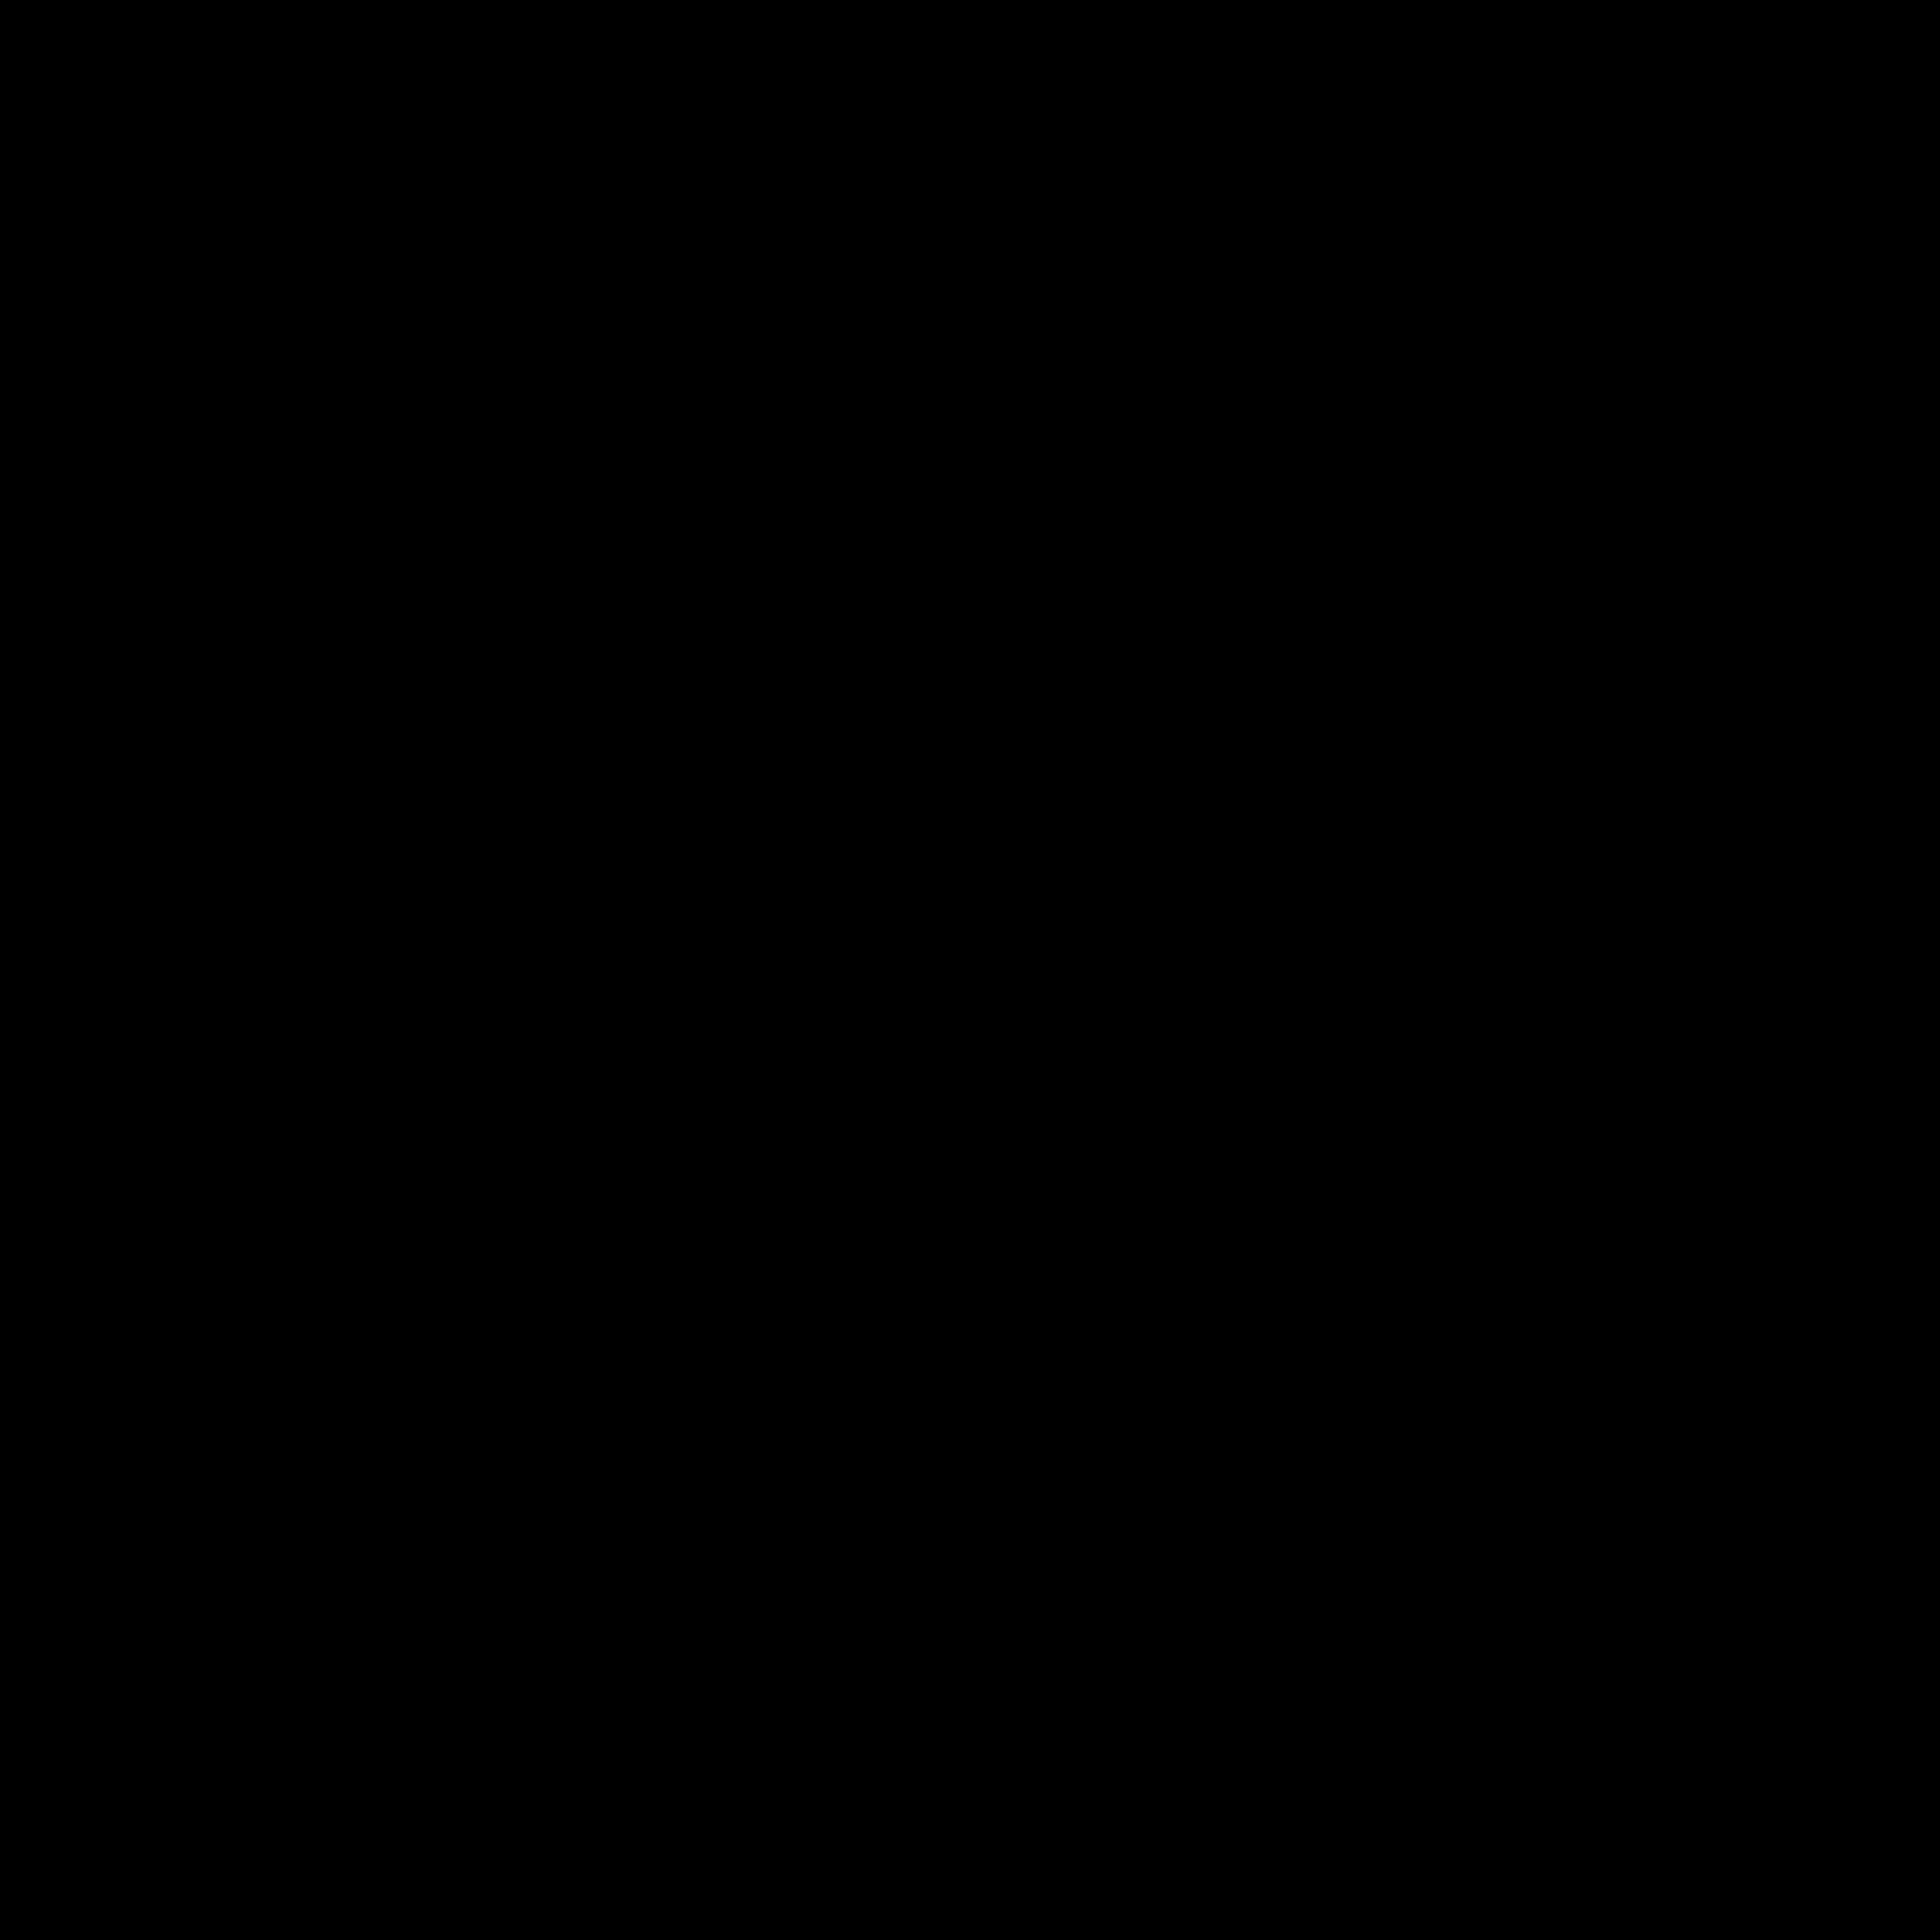 lvmh logo 0 - LVMH Logo